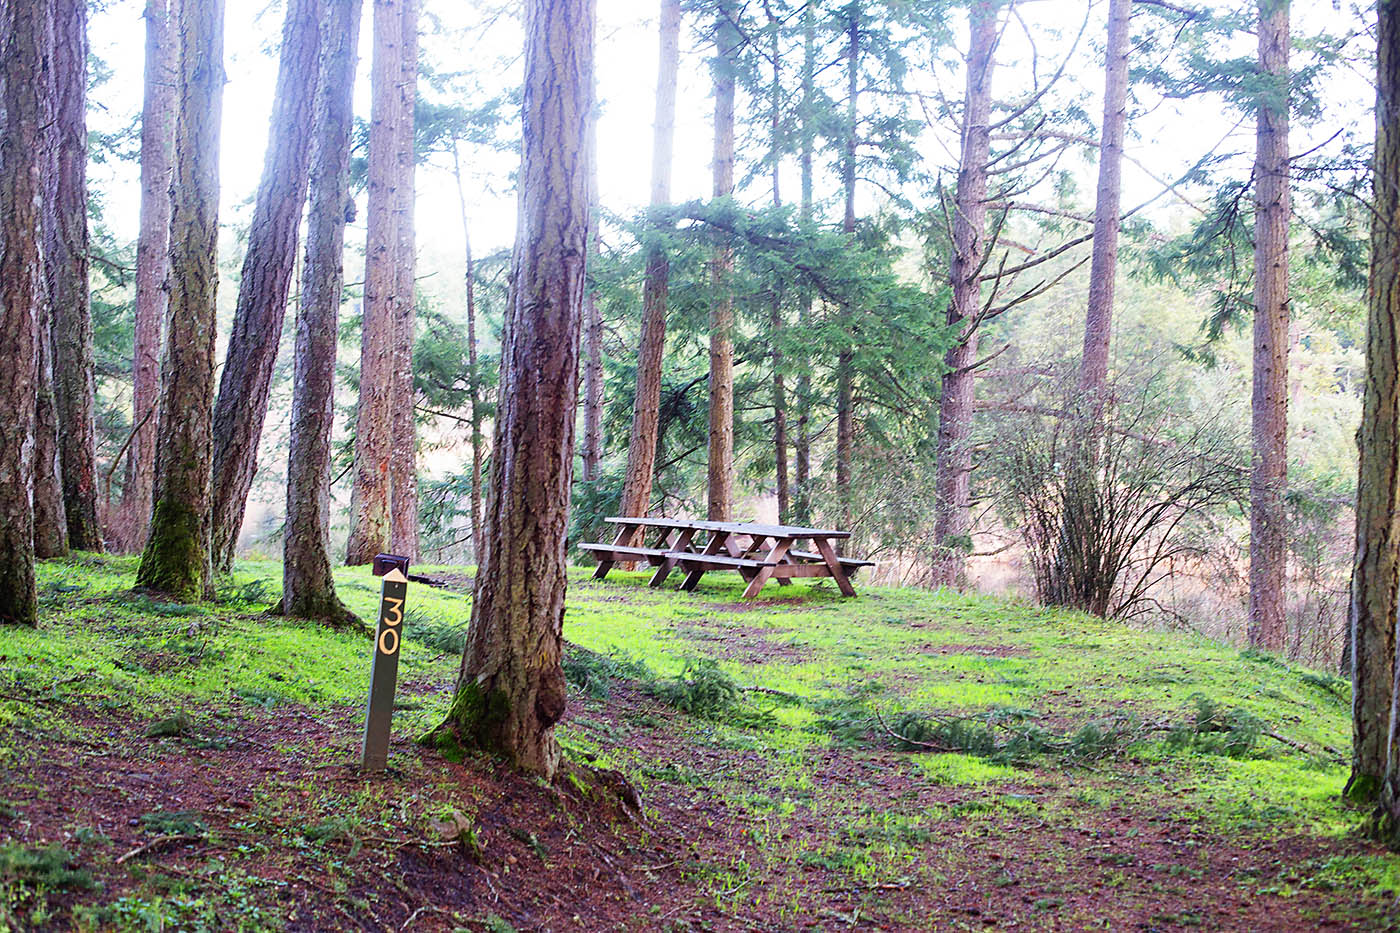 Lakedale campsite on San Juan Island near Washington